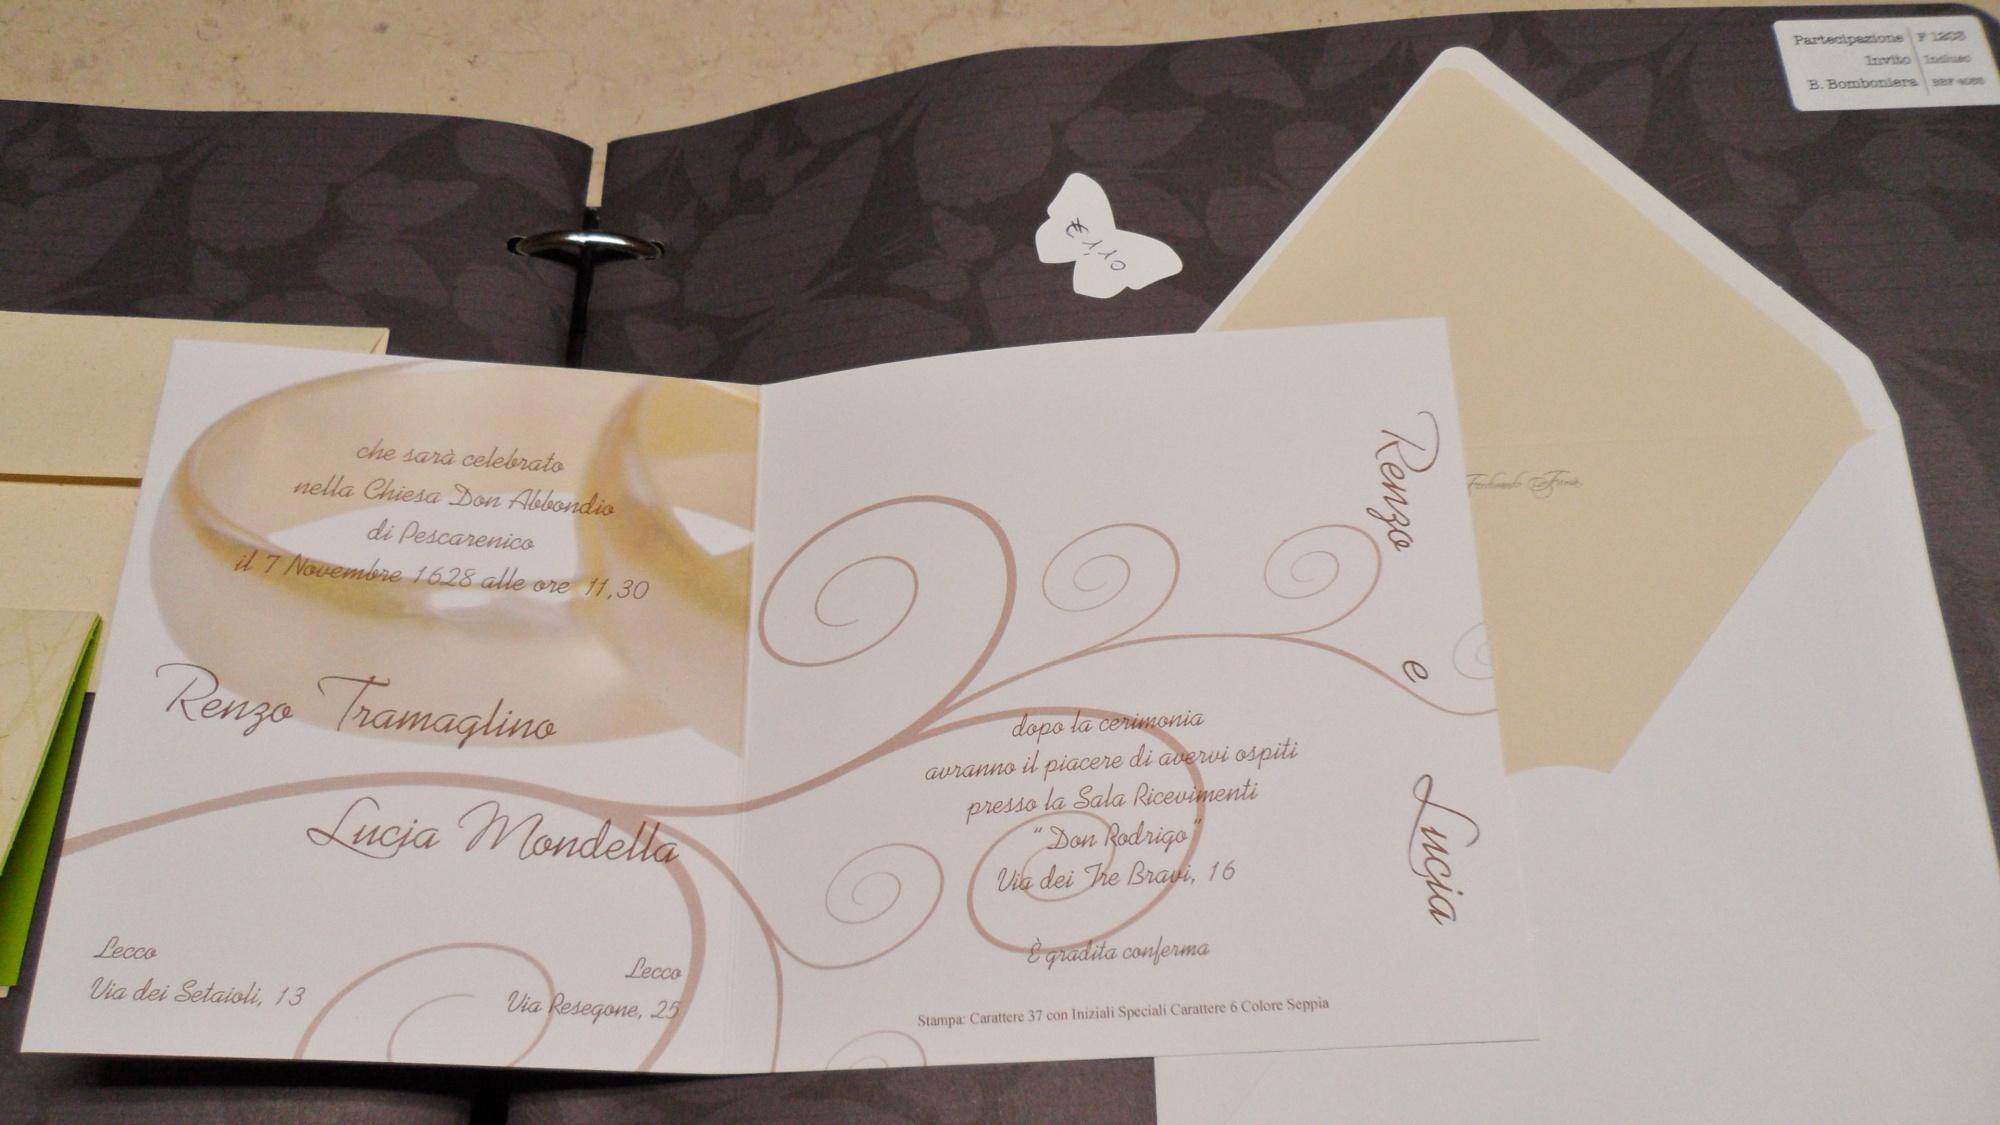 Partecipazioni Matrimonio 2018.Partecipazioni Nozze 2018 Originali Eleganti Spiritose